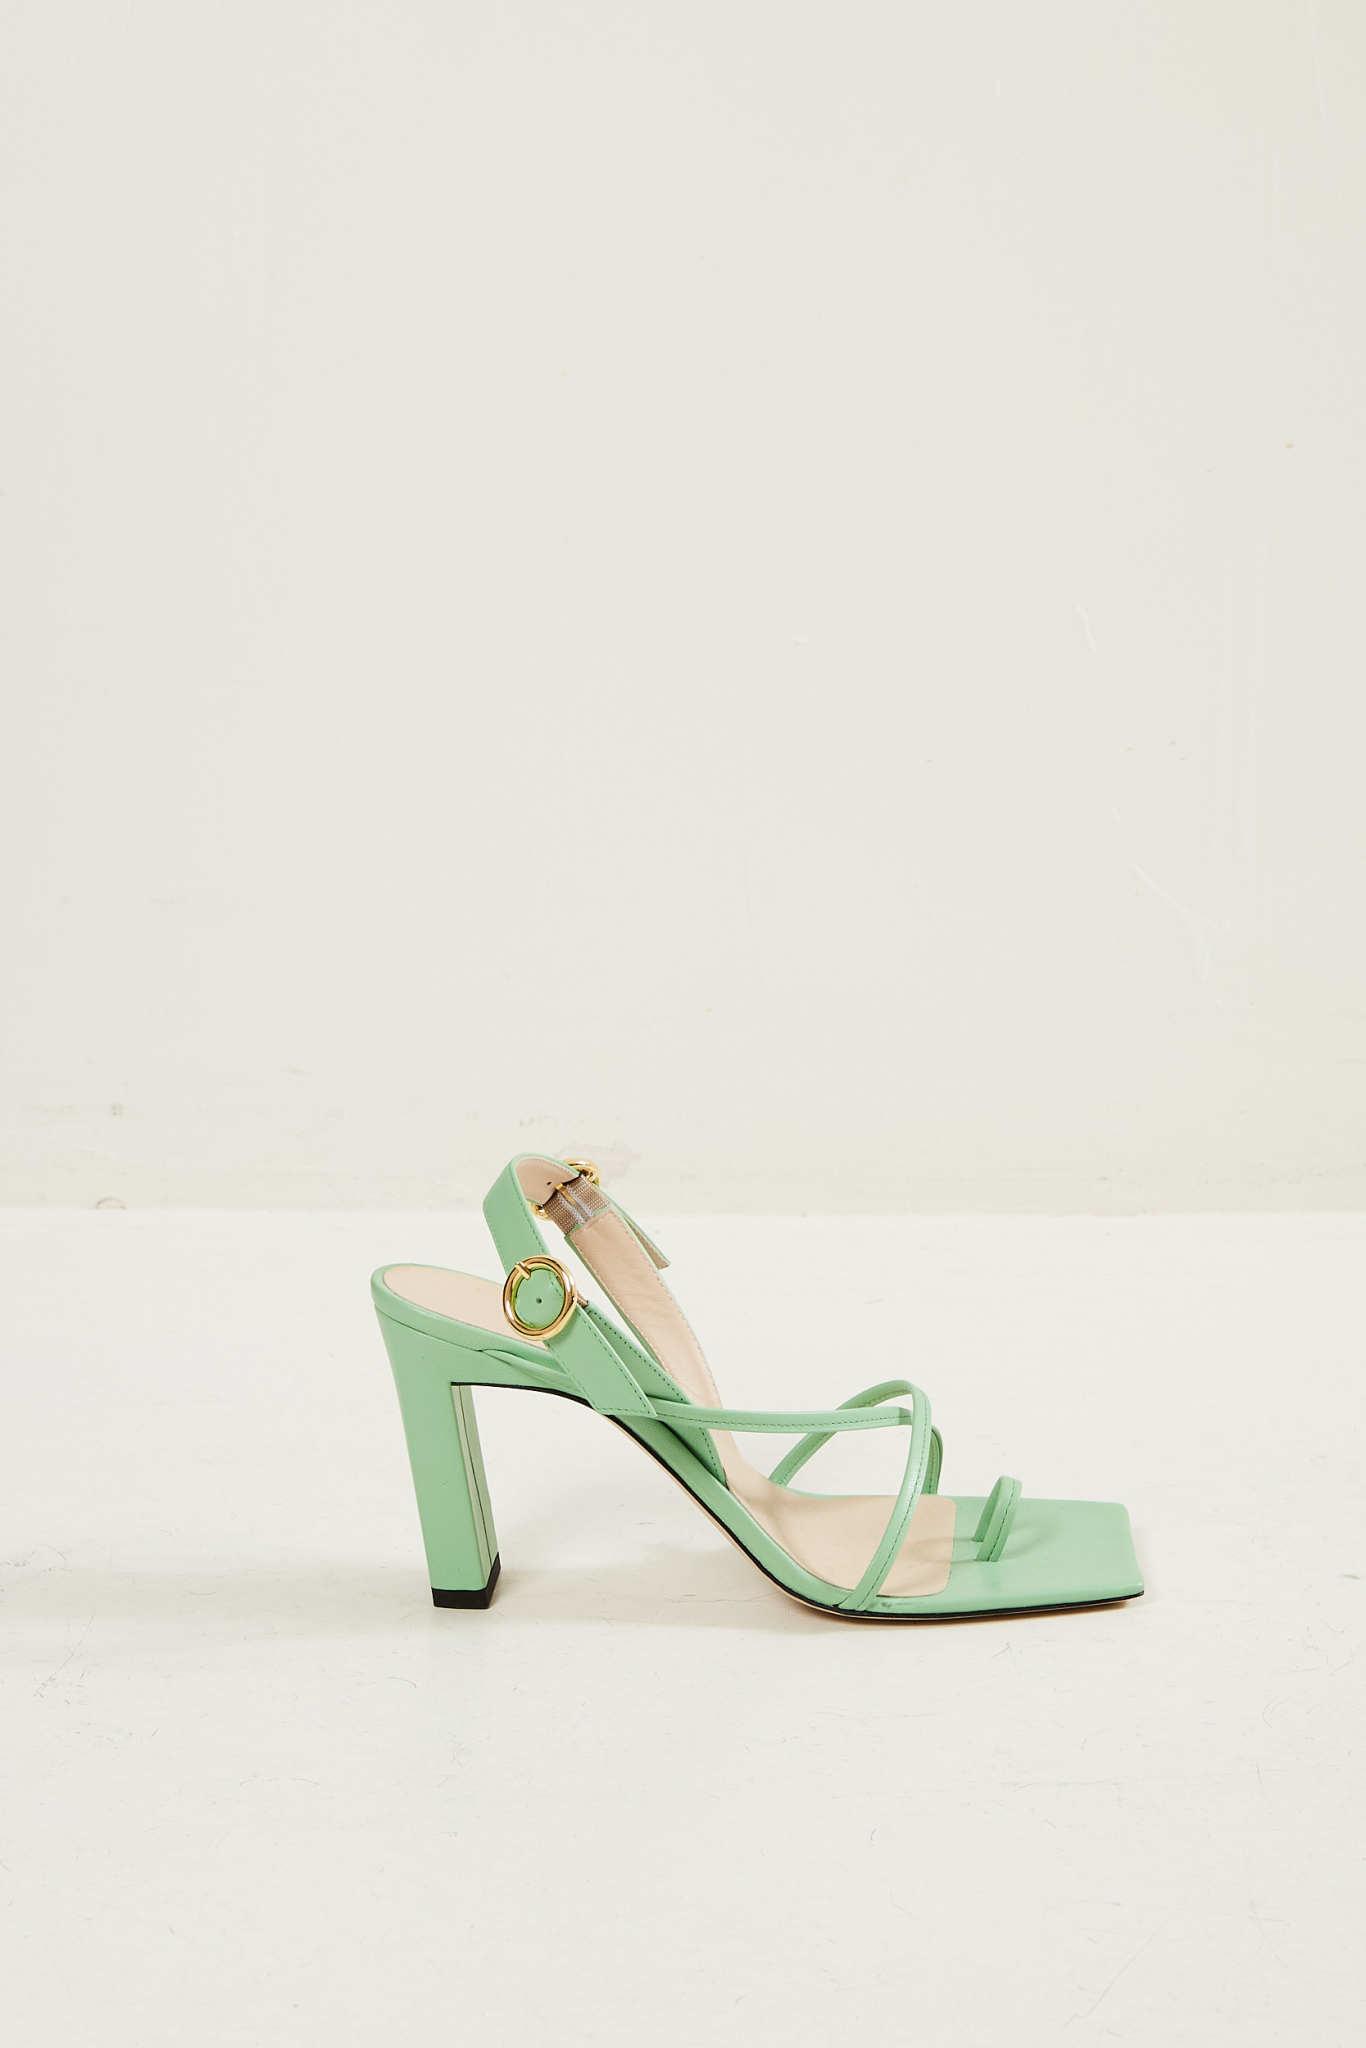 Wandler - Elza lambskin leather sandal